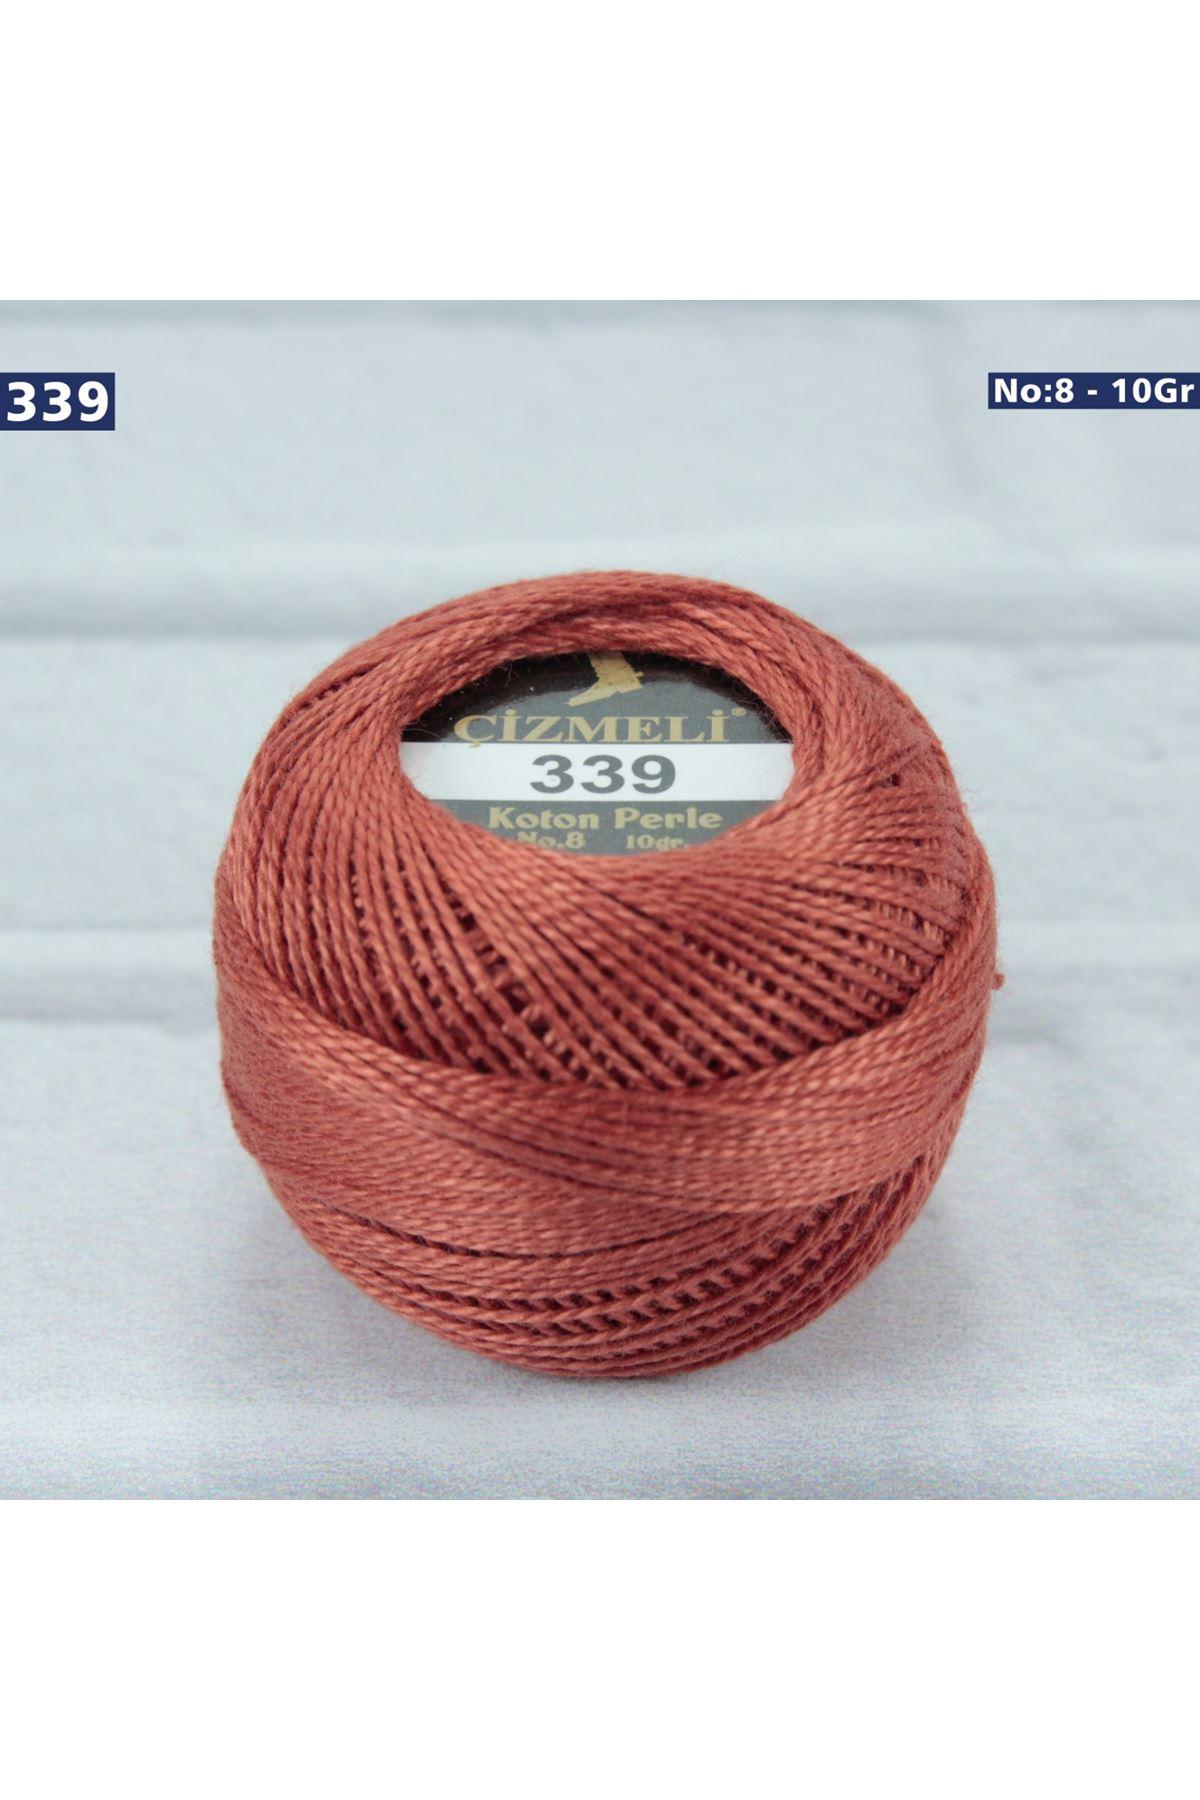 Çizmeli Cotton Perle Nakış İpliği No: 339